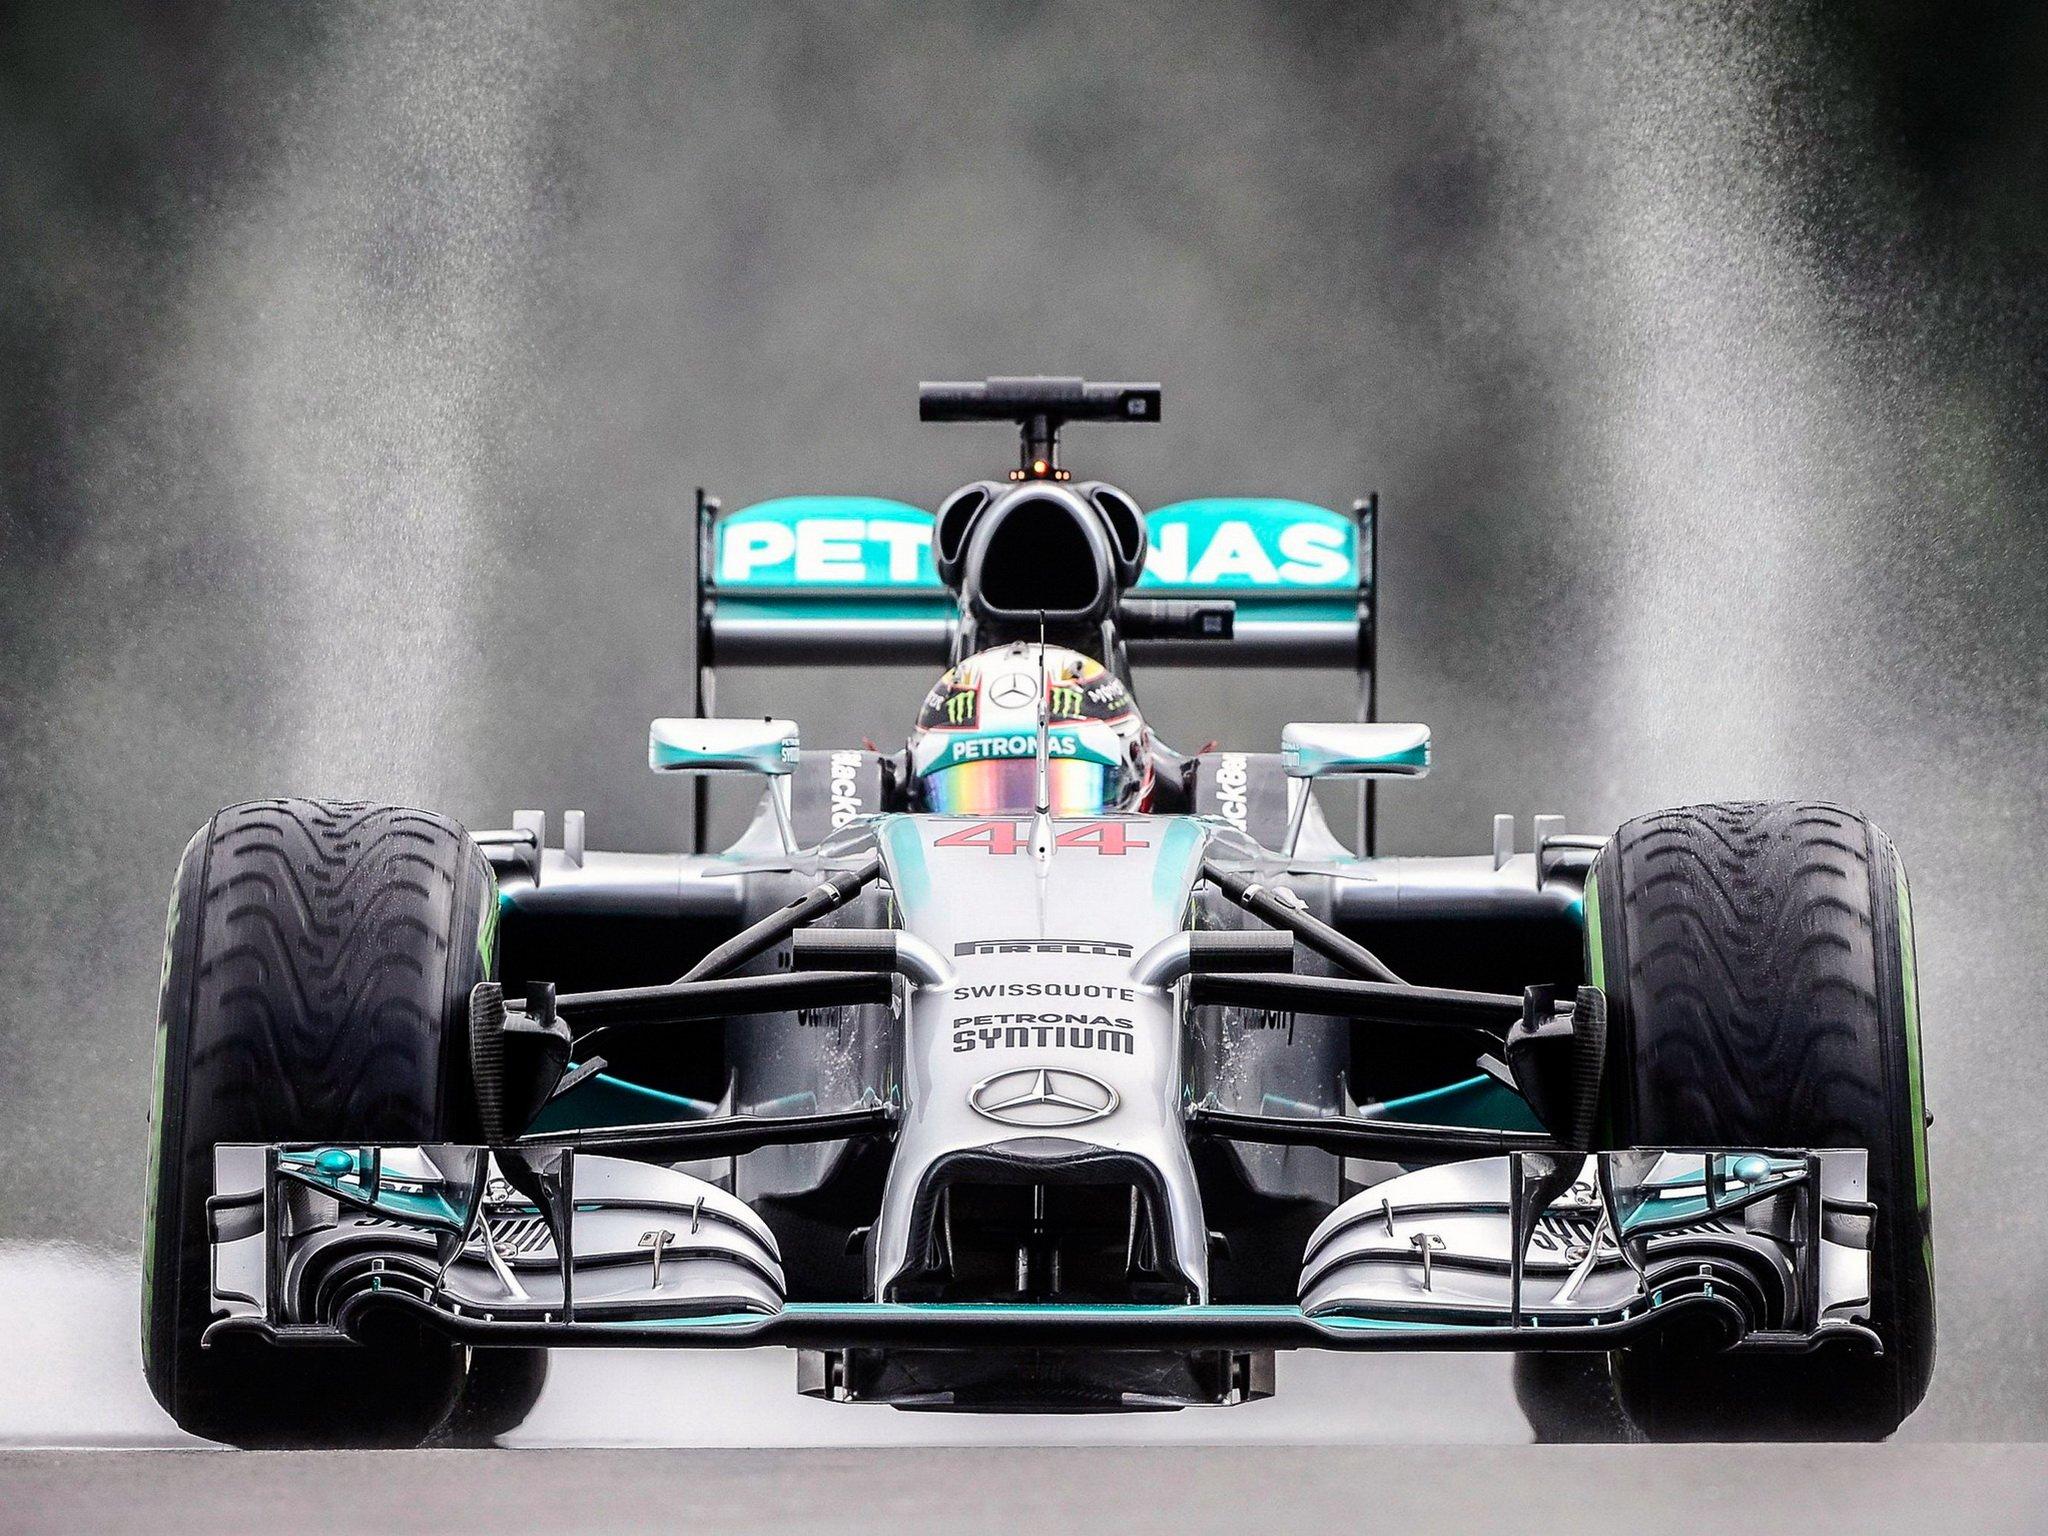 2014 Mercedes Amg F 1 W05 Formula Race Racing Wallpaper